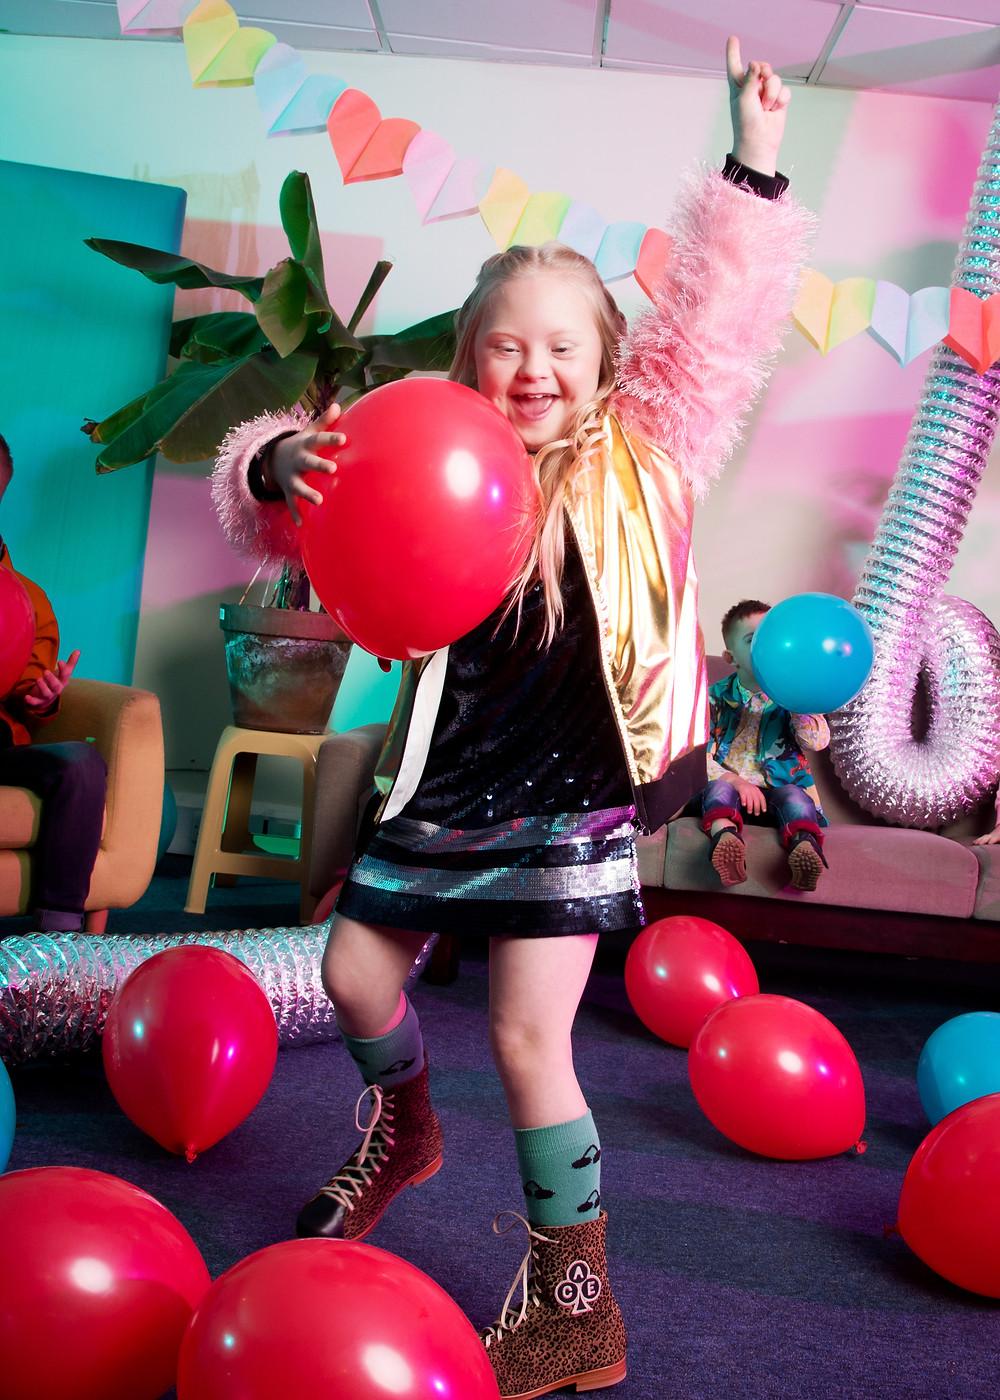 Kids fashion photo shoot for World Down Syndrome